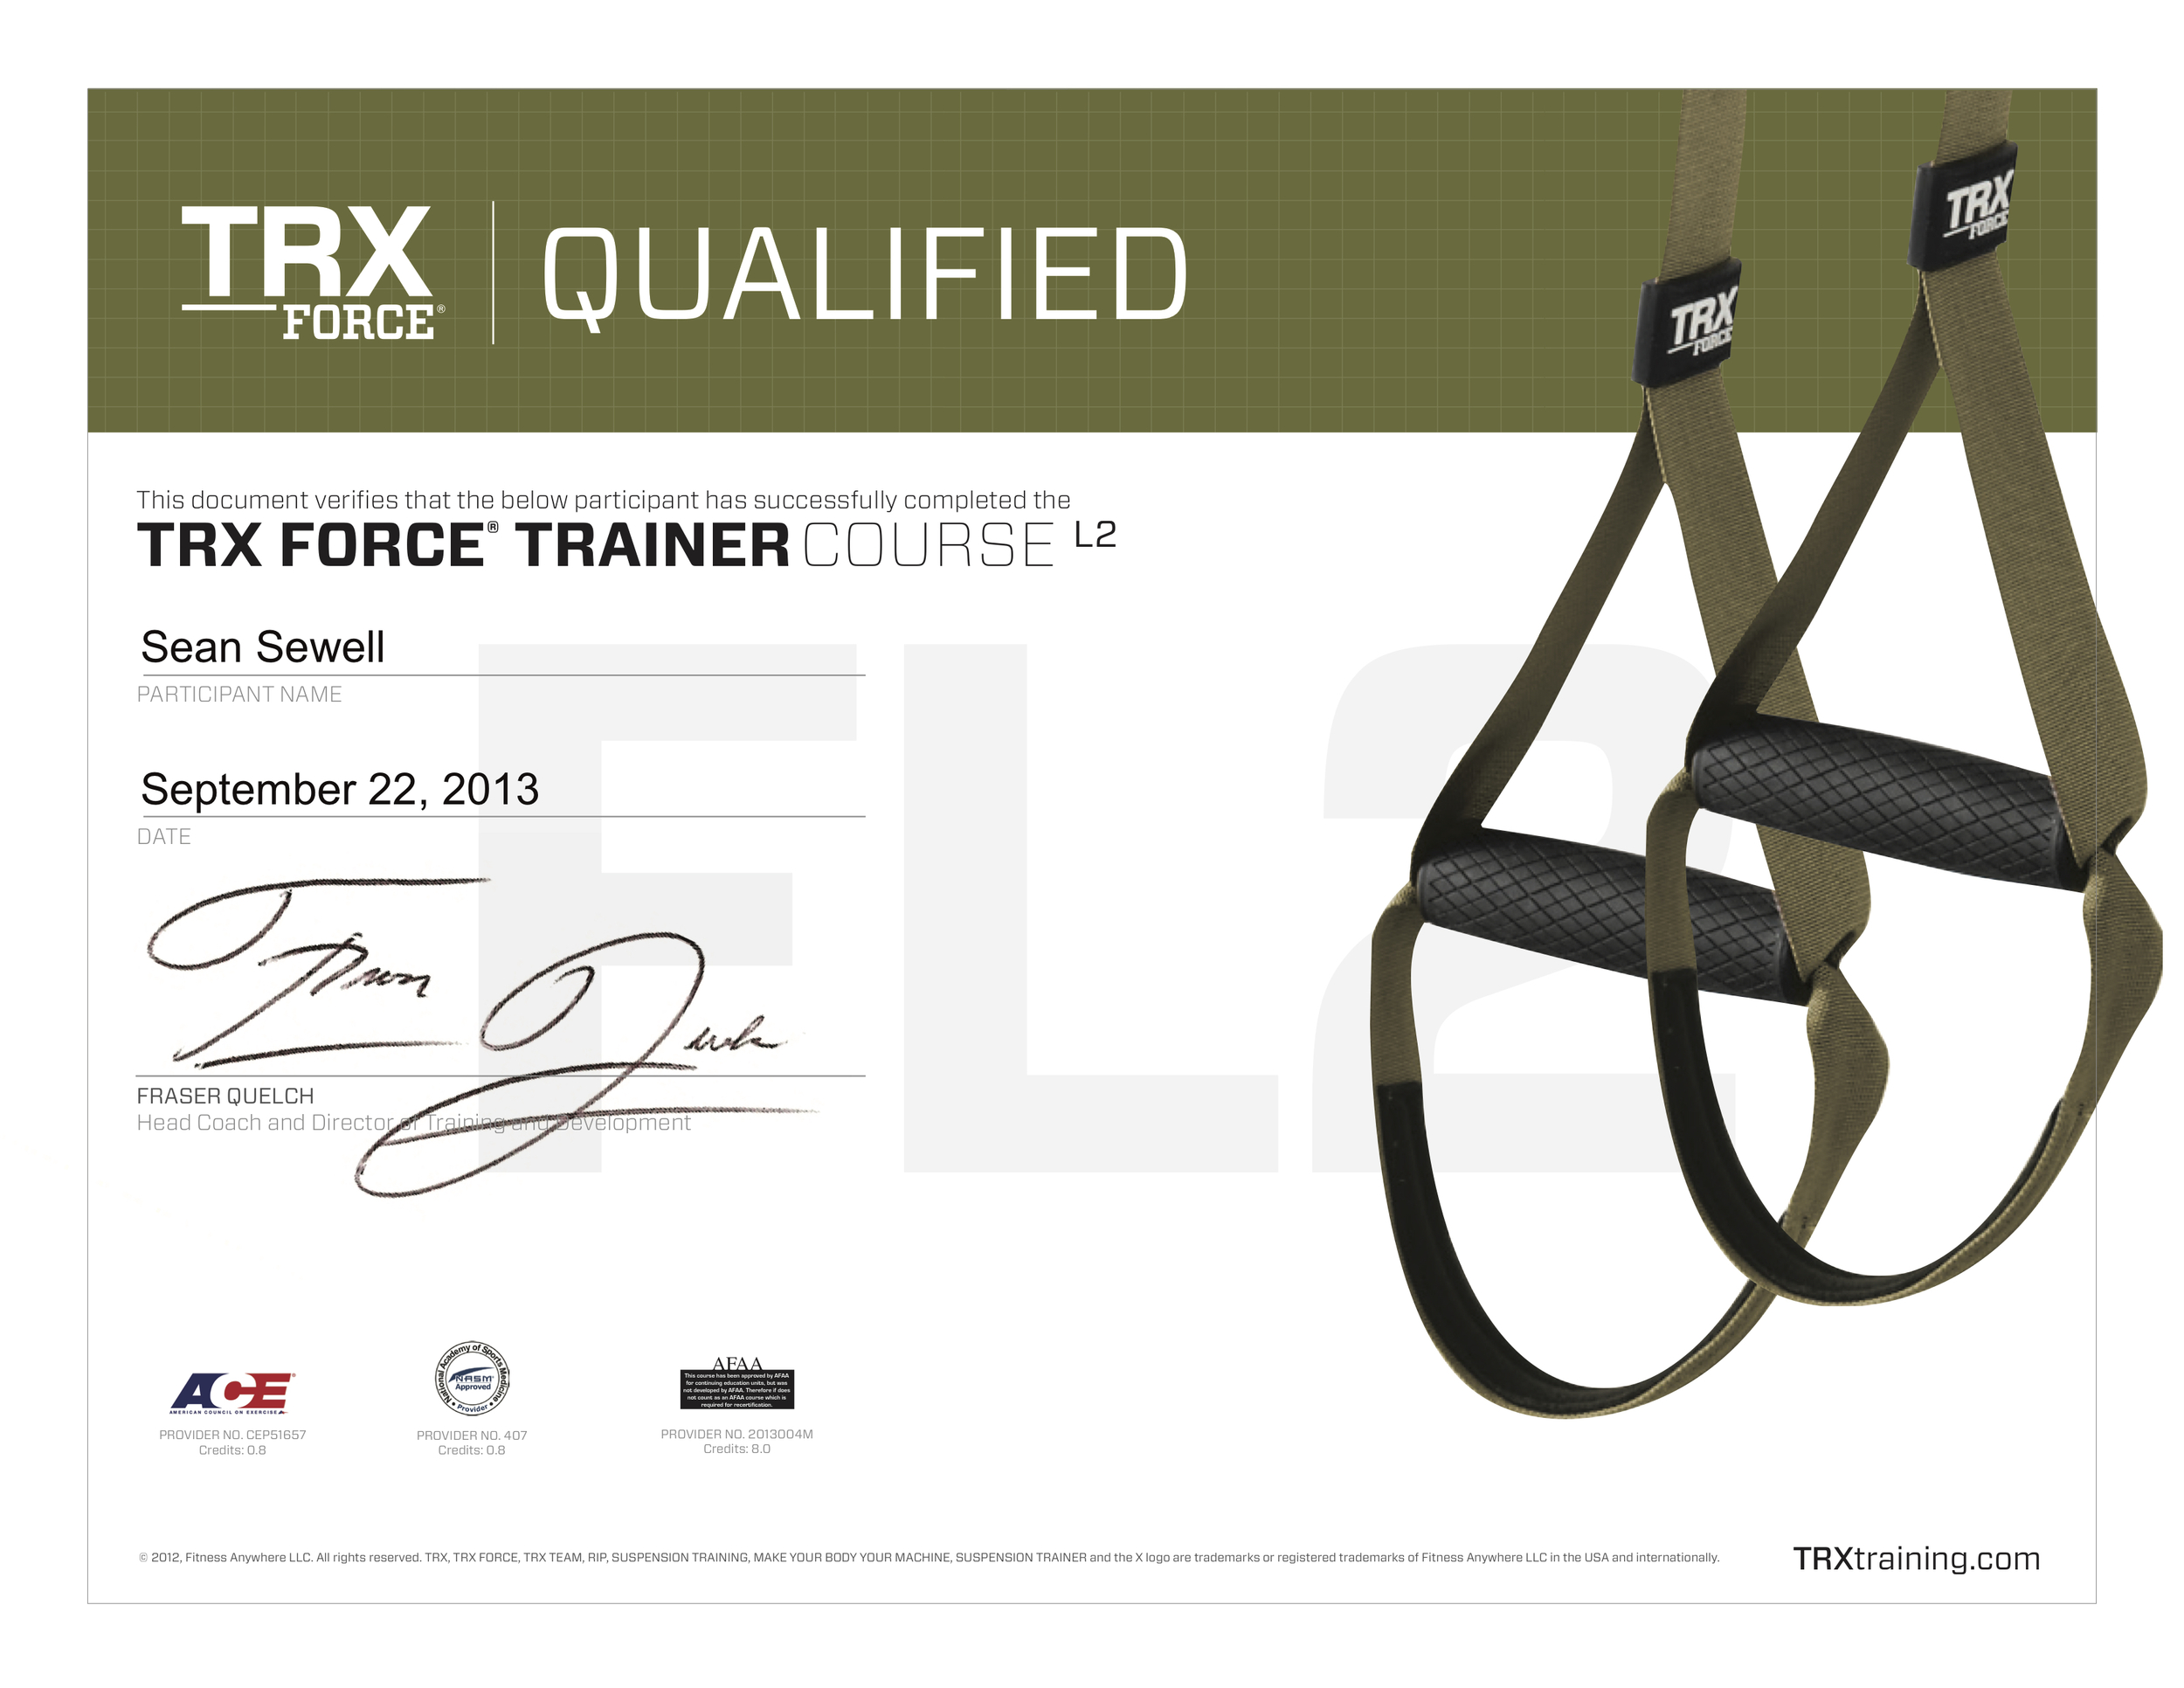 TRX Force Certificate.jpg